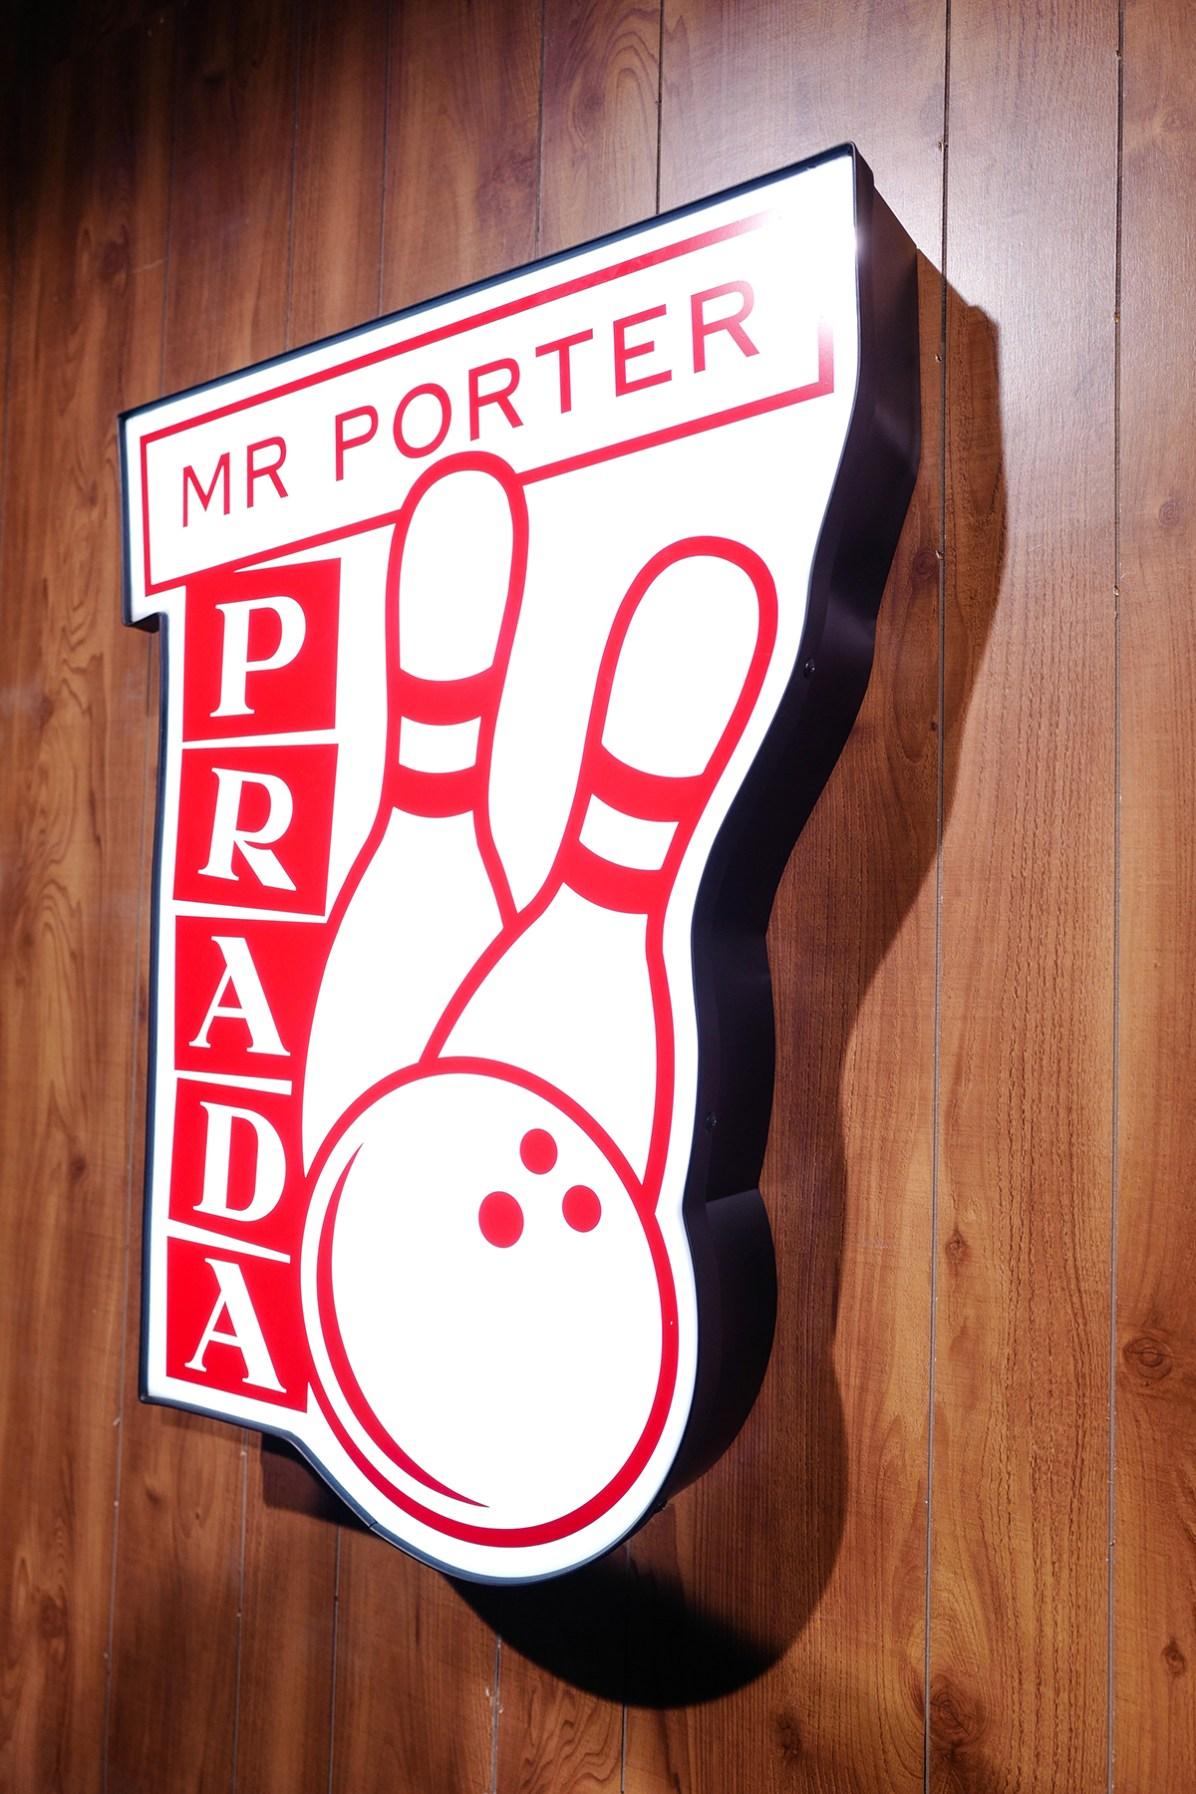 mr-porter-x-prada-event-the-impression-0041